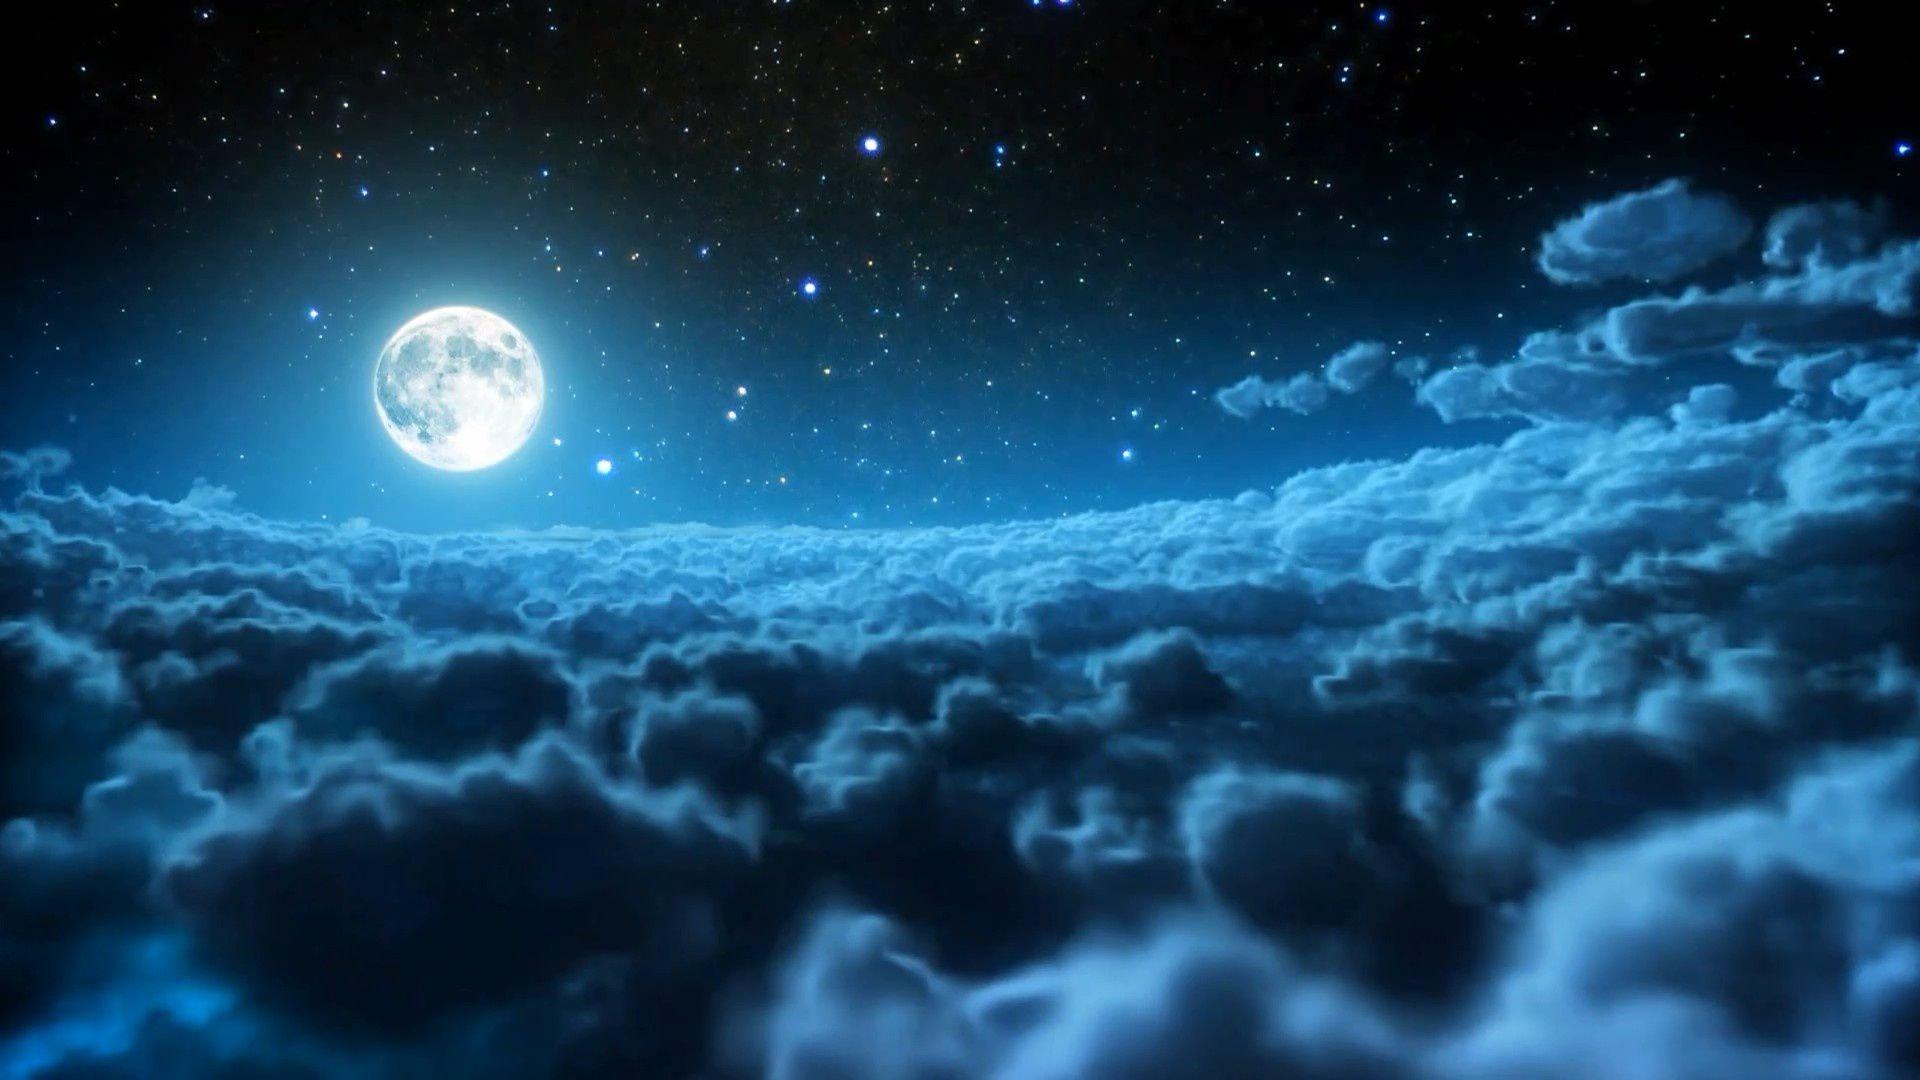 Moon Backgrounds Resolution 1920x1080 Kasandra Styron 1920x1080